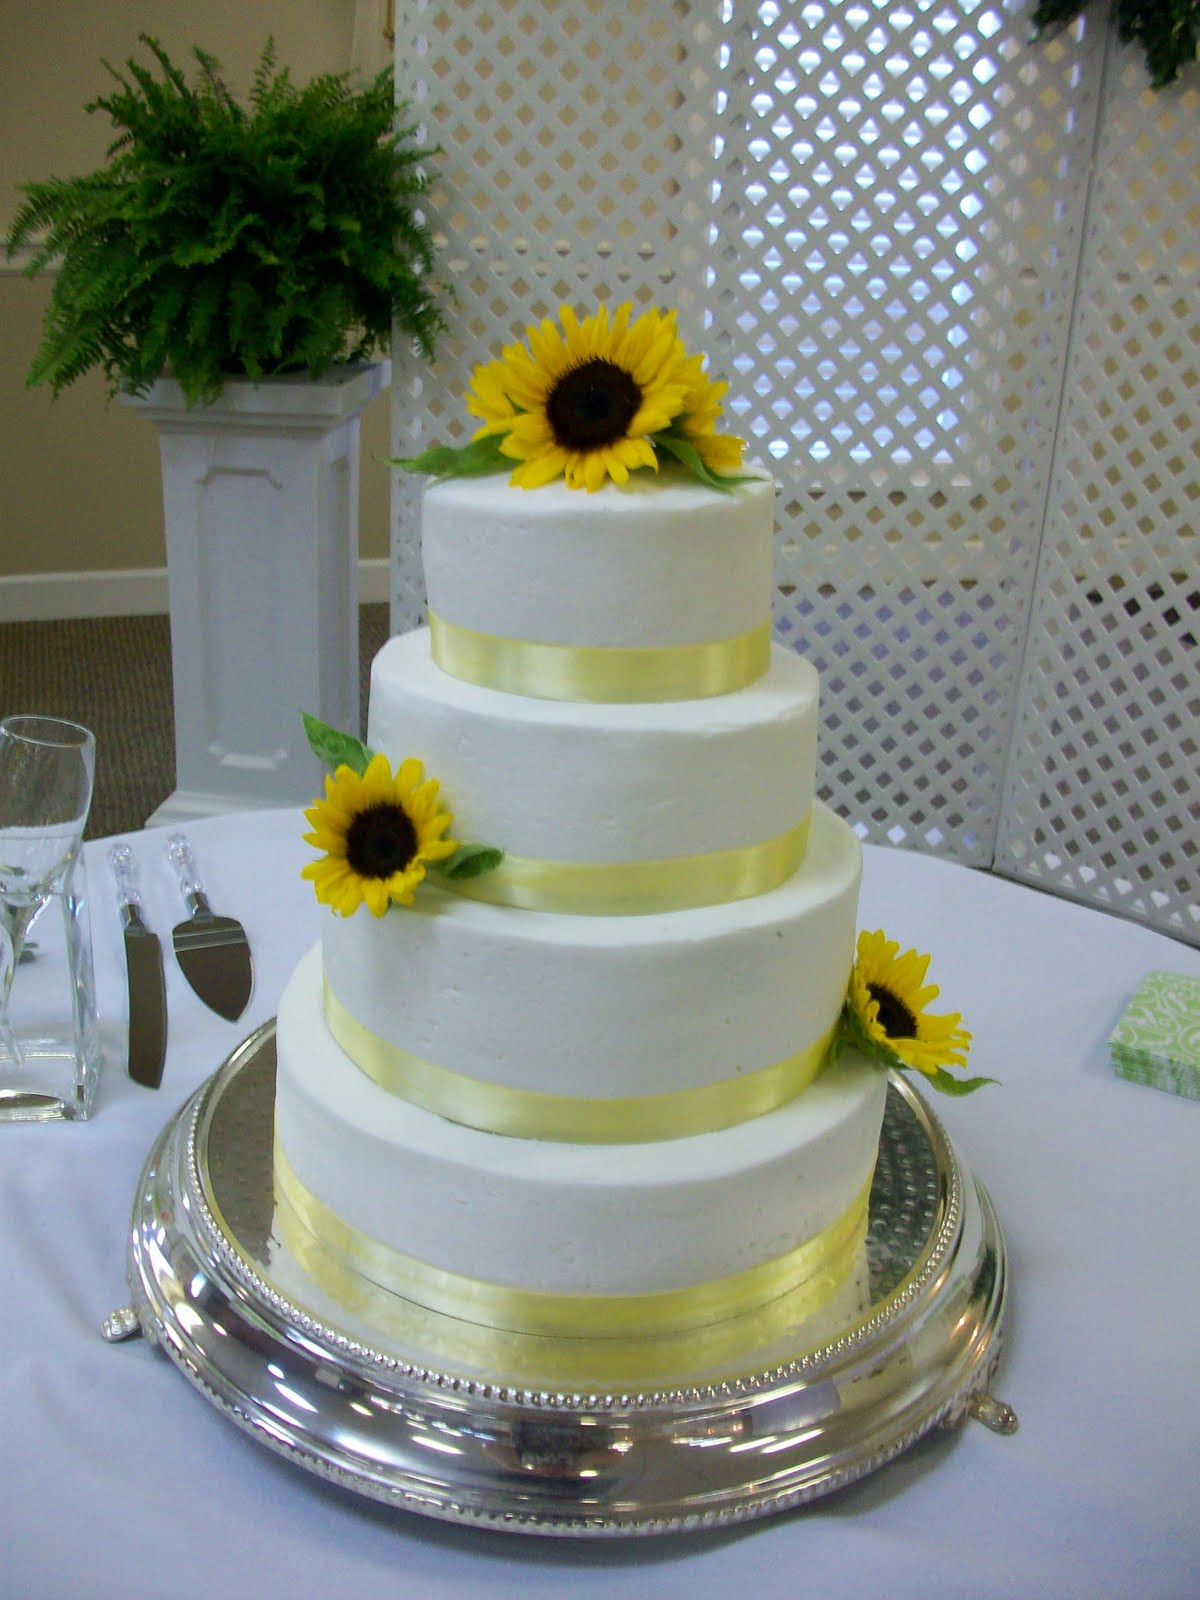 Best - Wedding Cake 5/15/